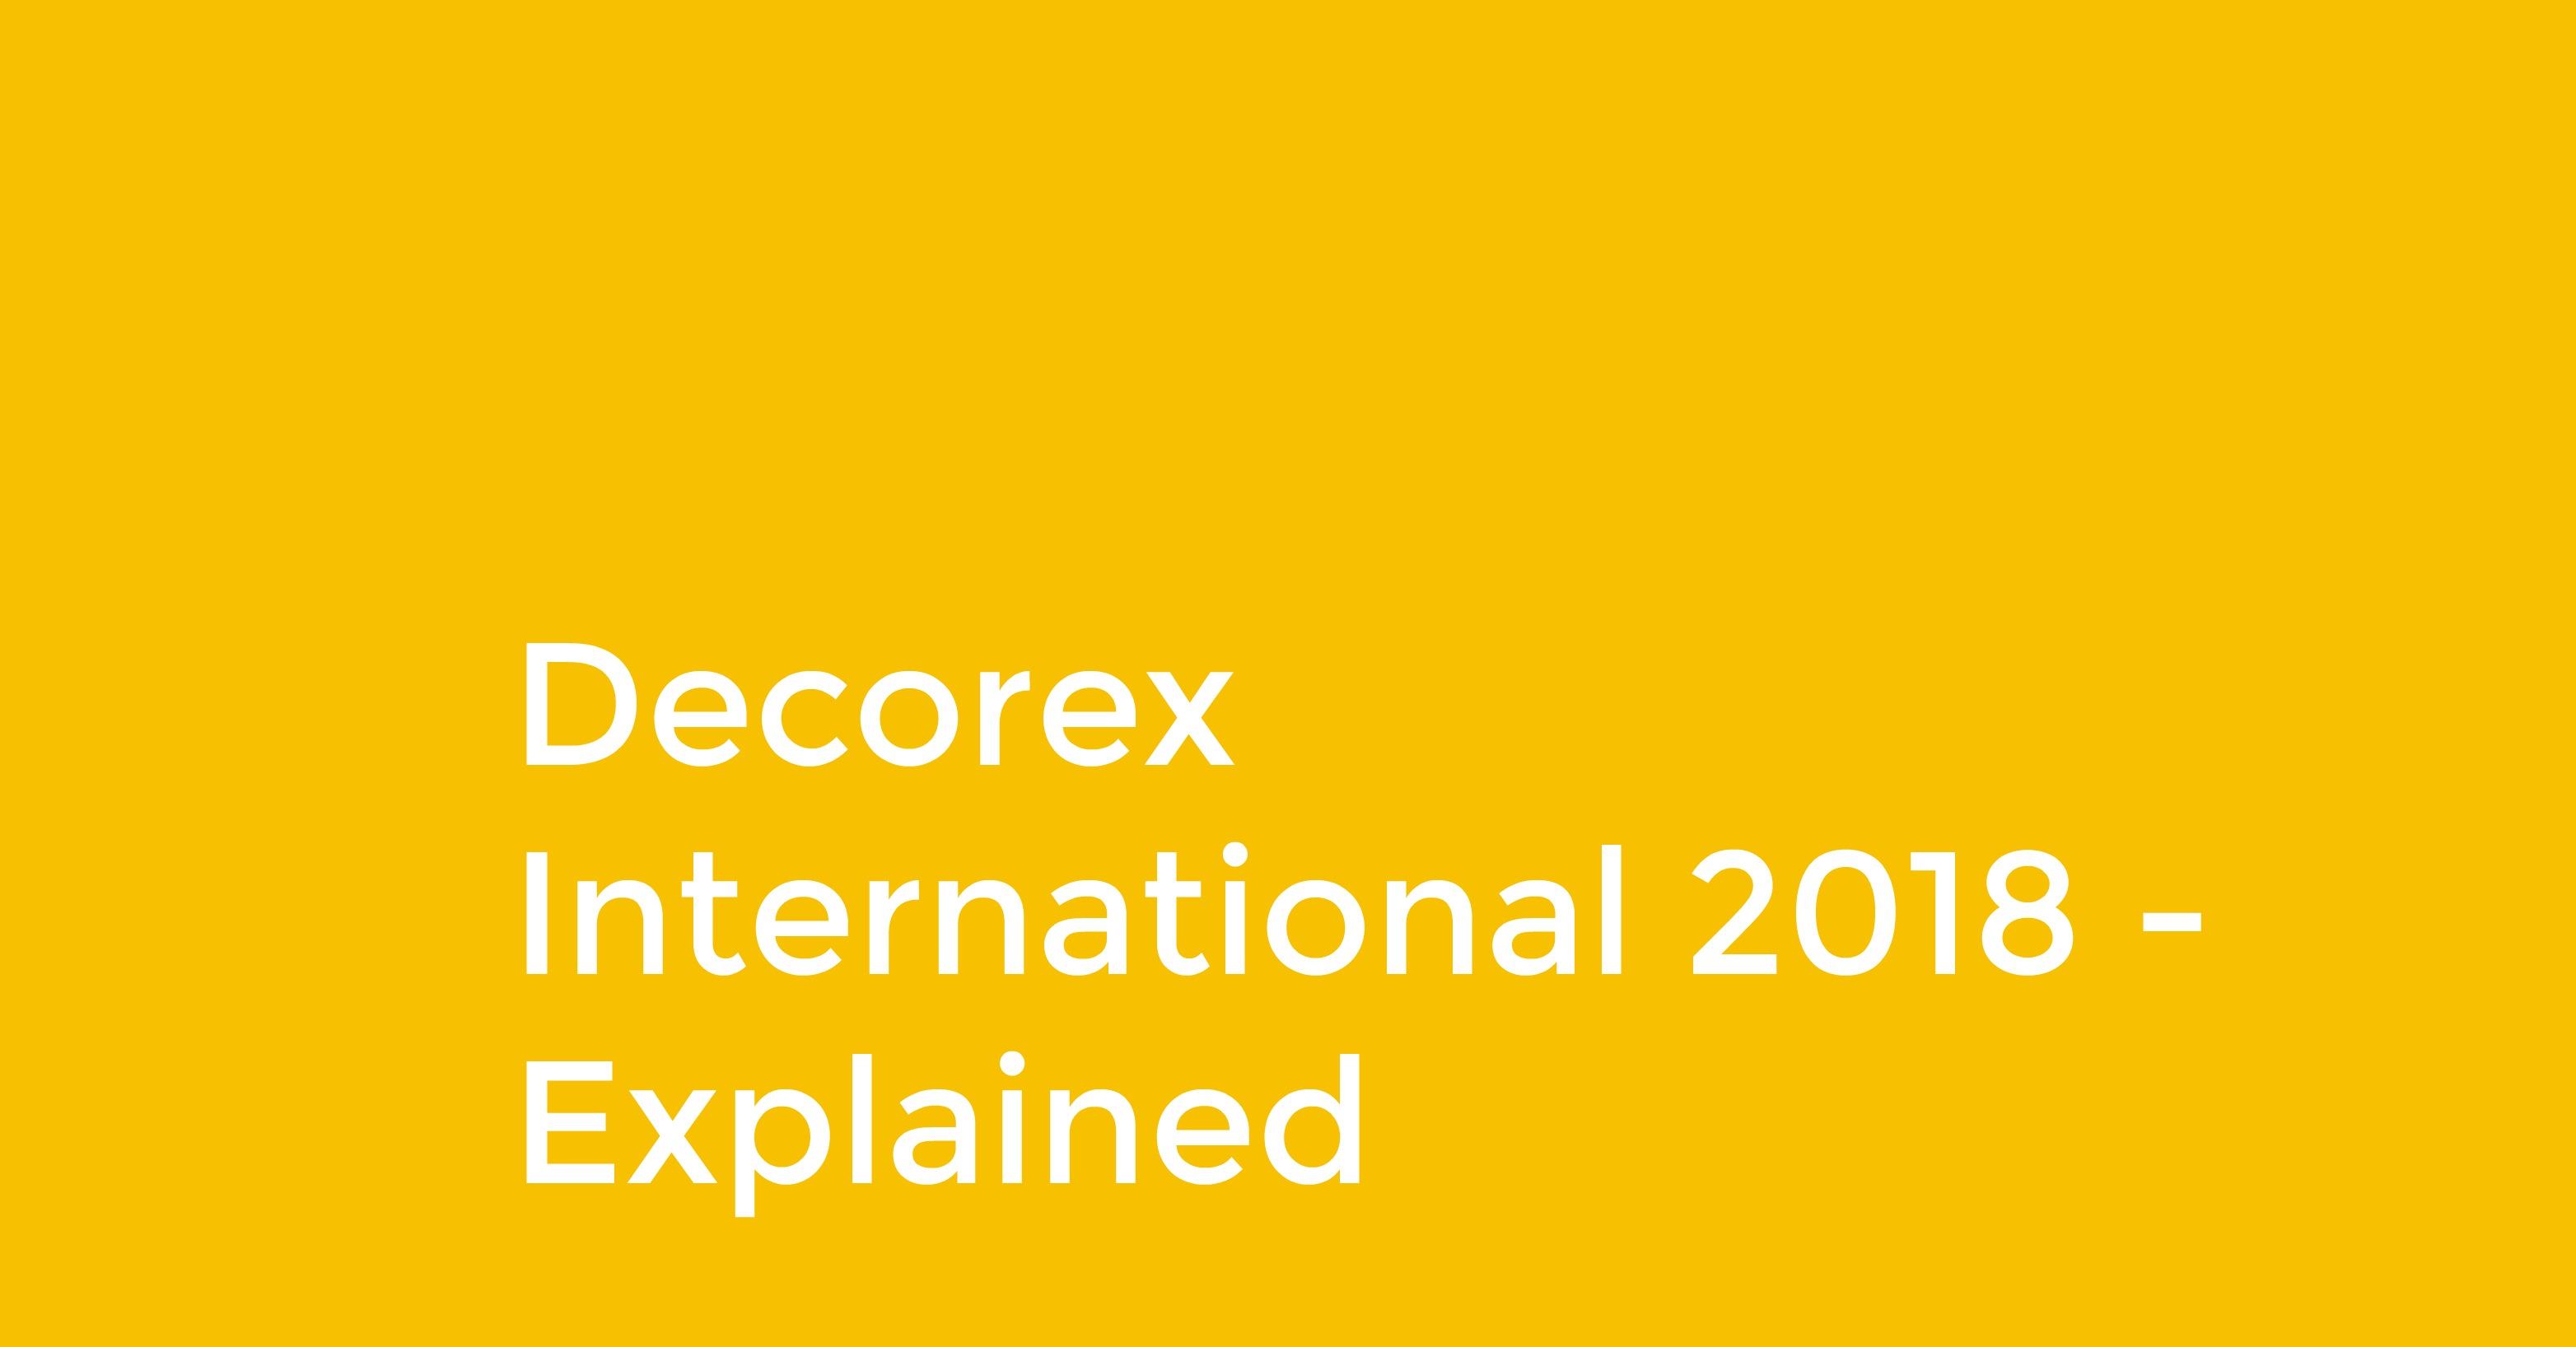 Decorex International 2018 - UK's Leading Interior Design